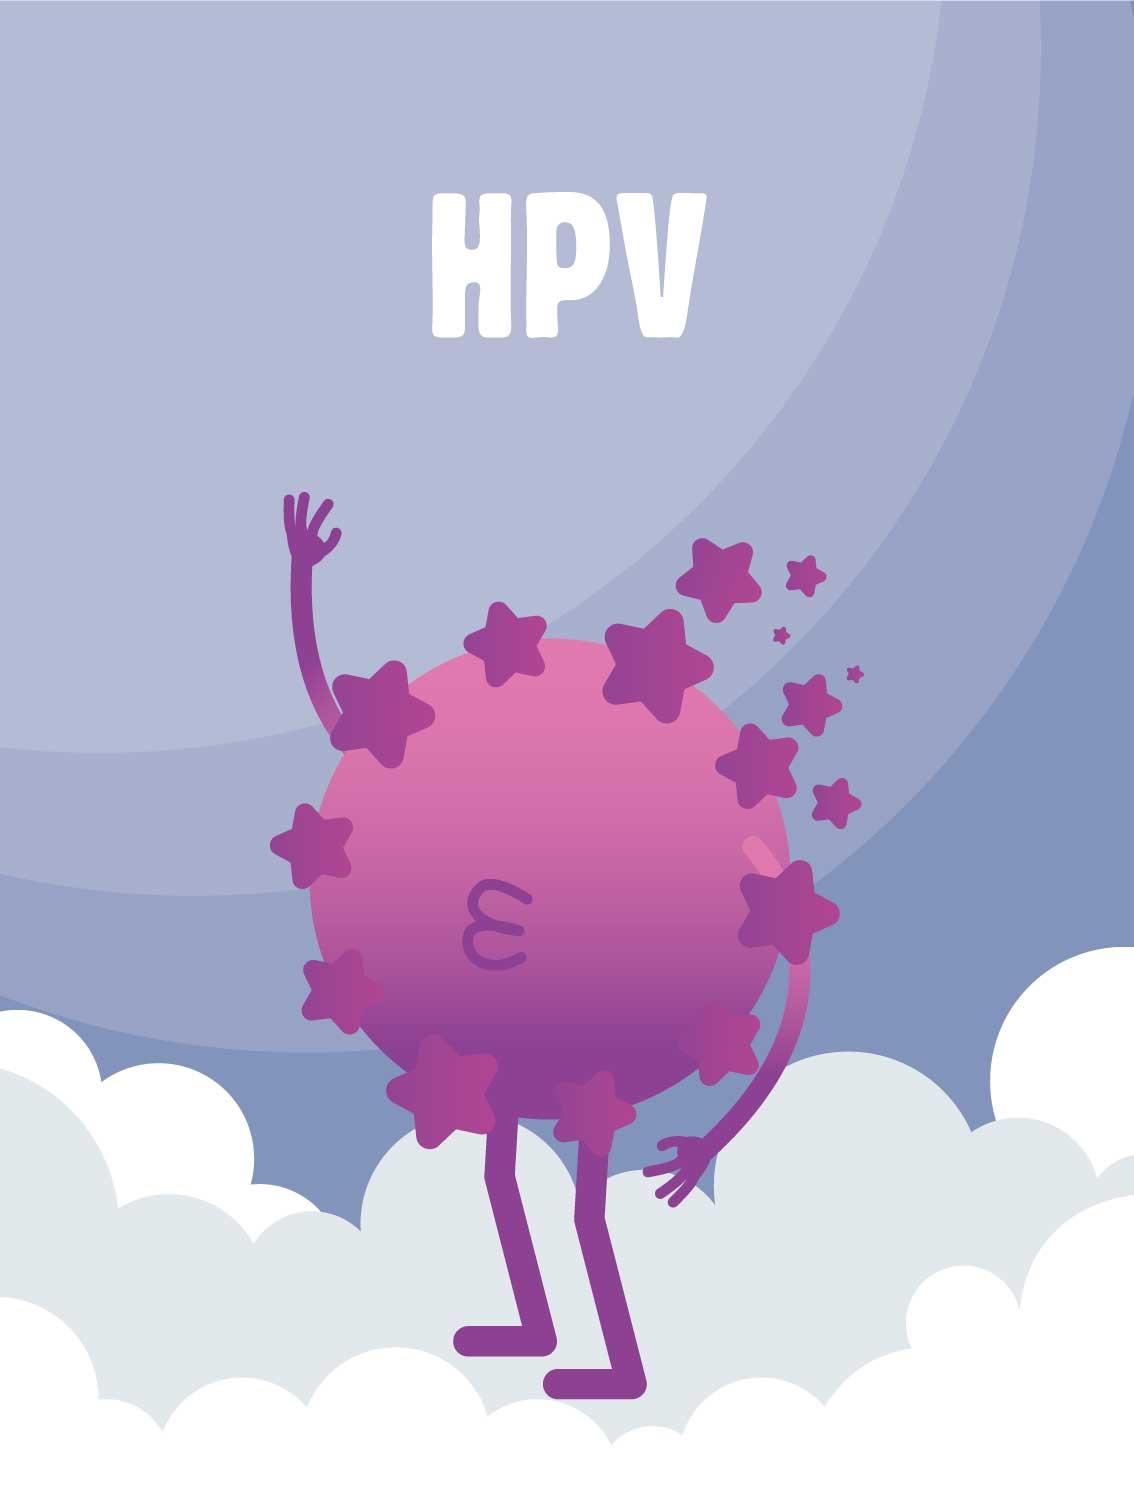 grossesse hpv positif)